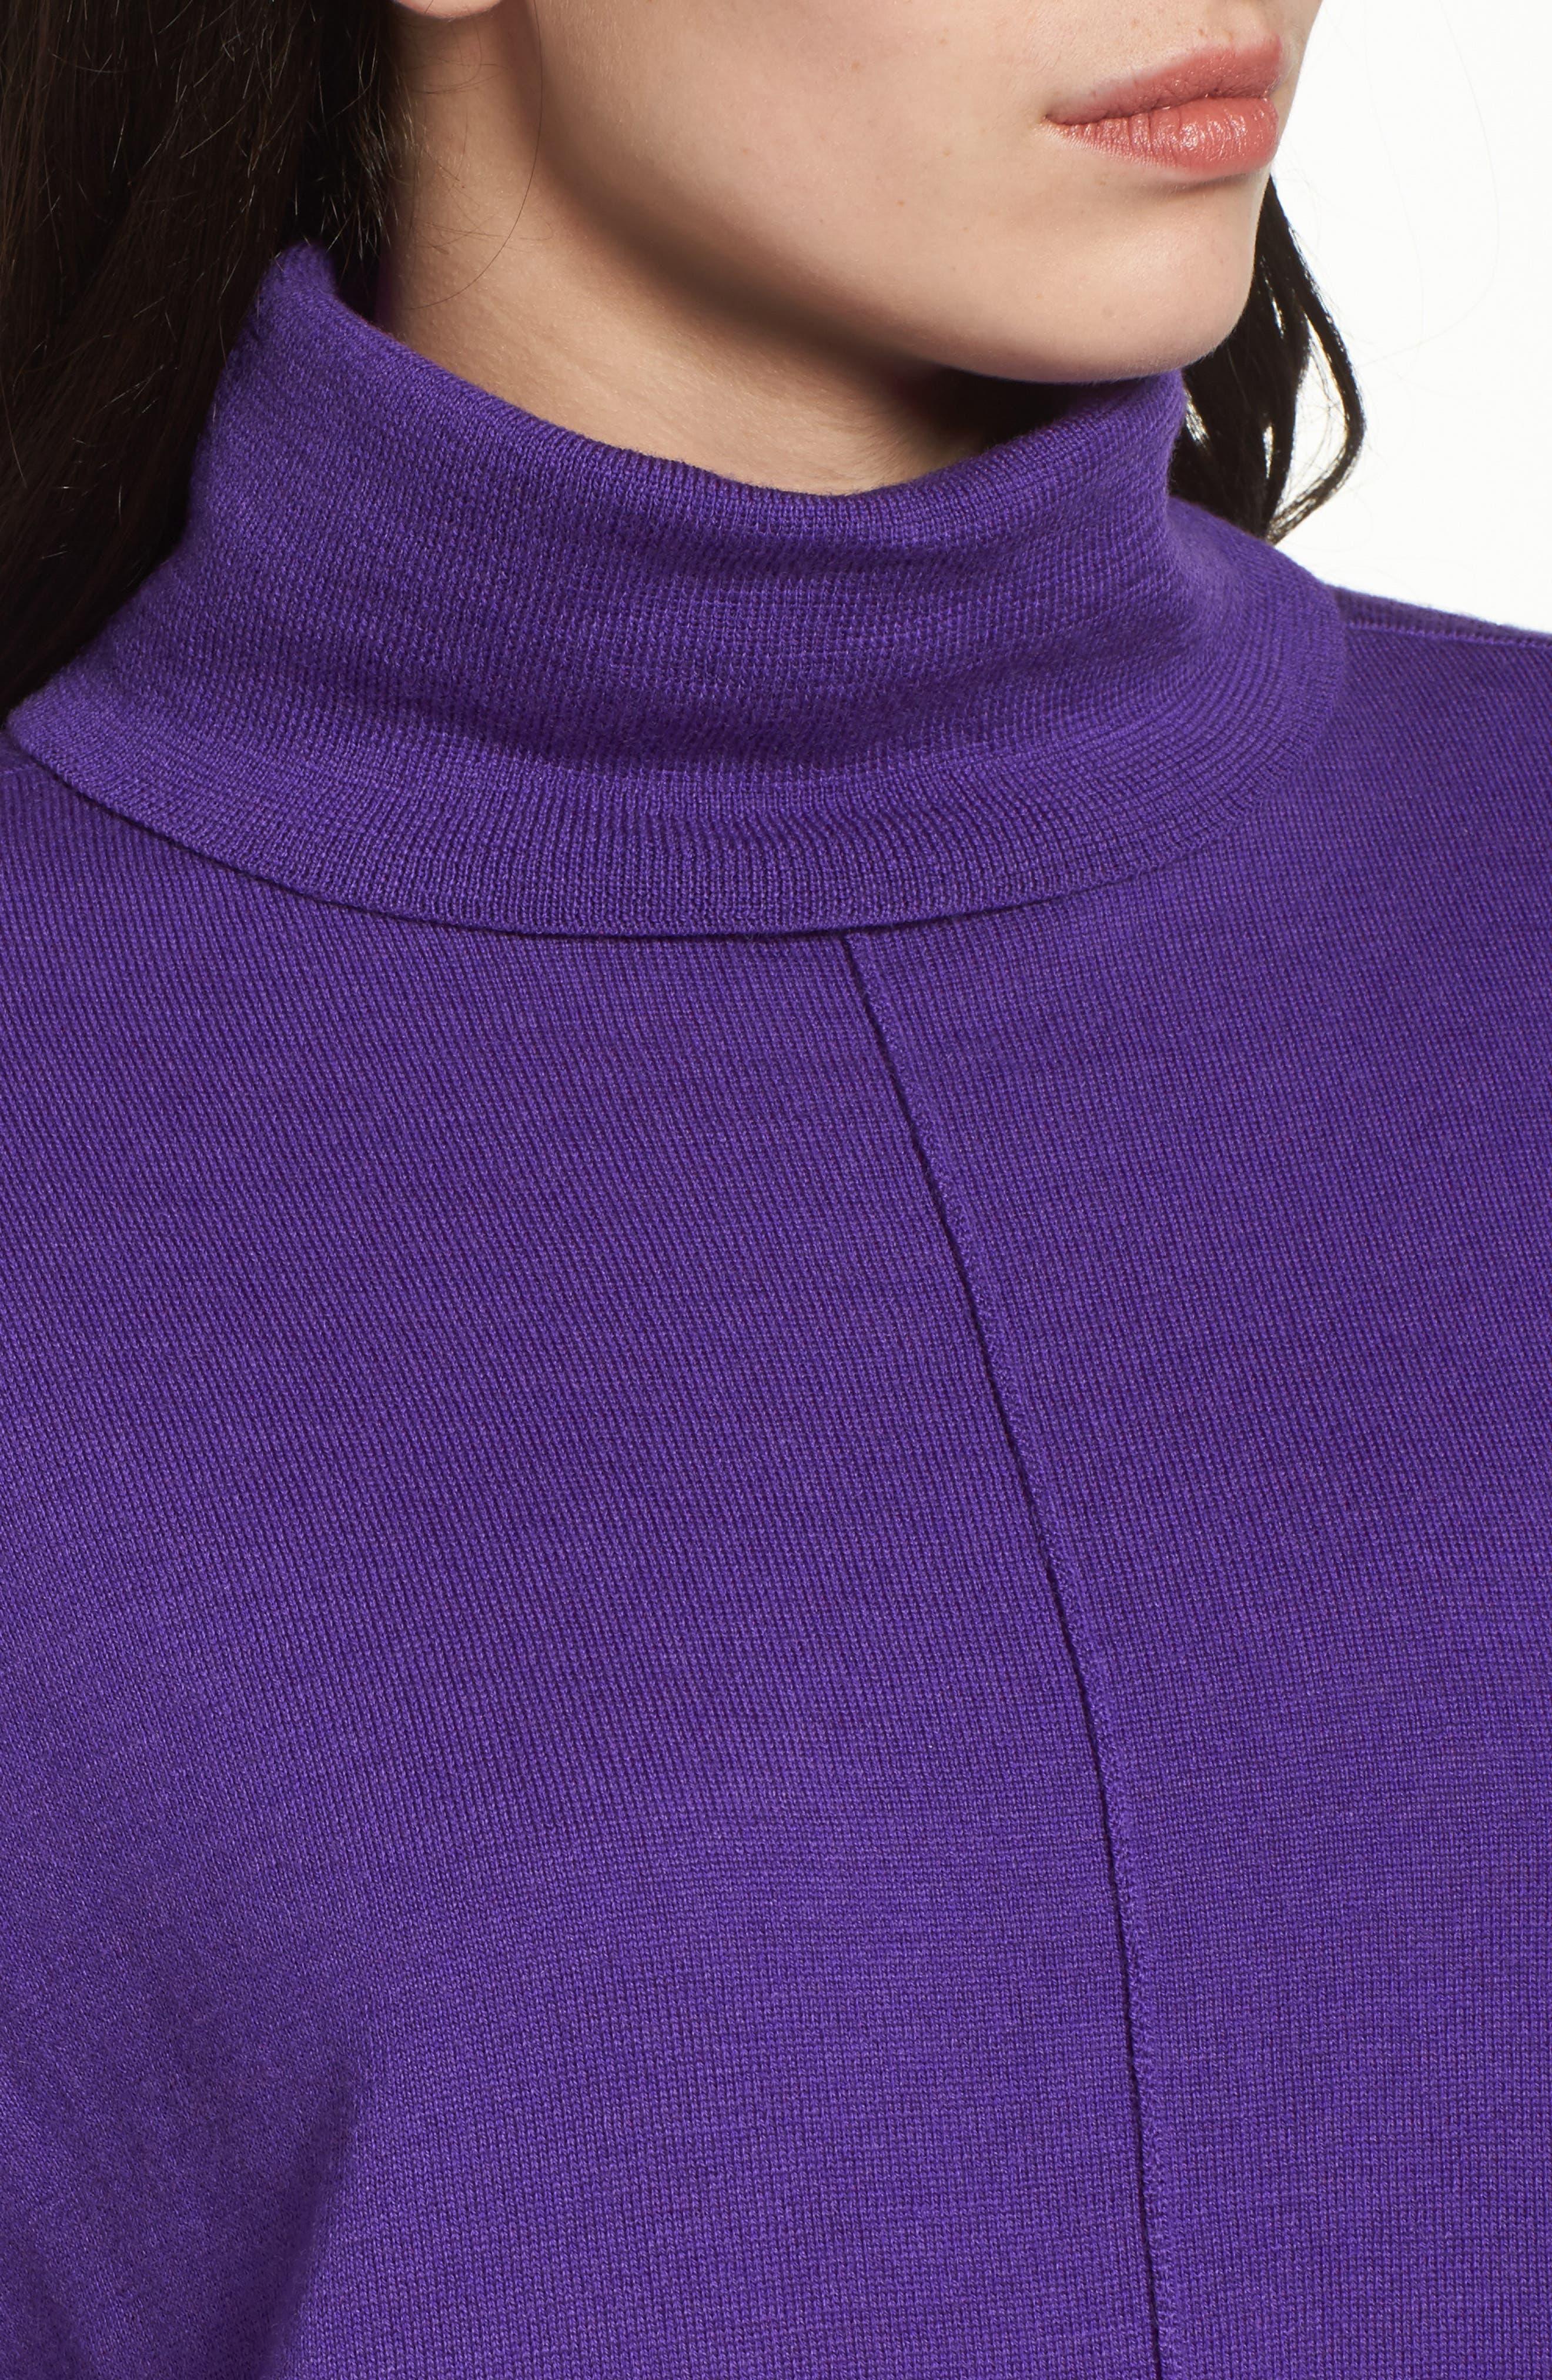 Merino Wool Boxy Turtleneck Sweater,                             Alternate thumbnail 23, color,